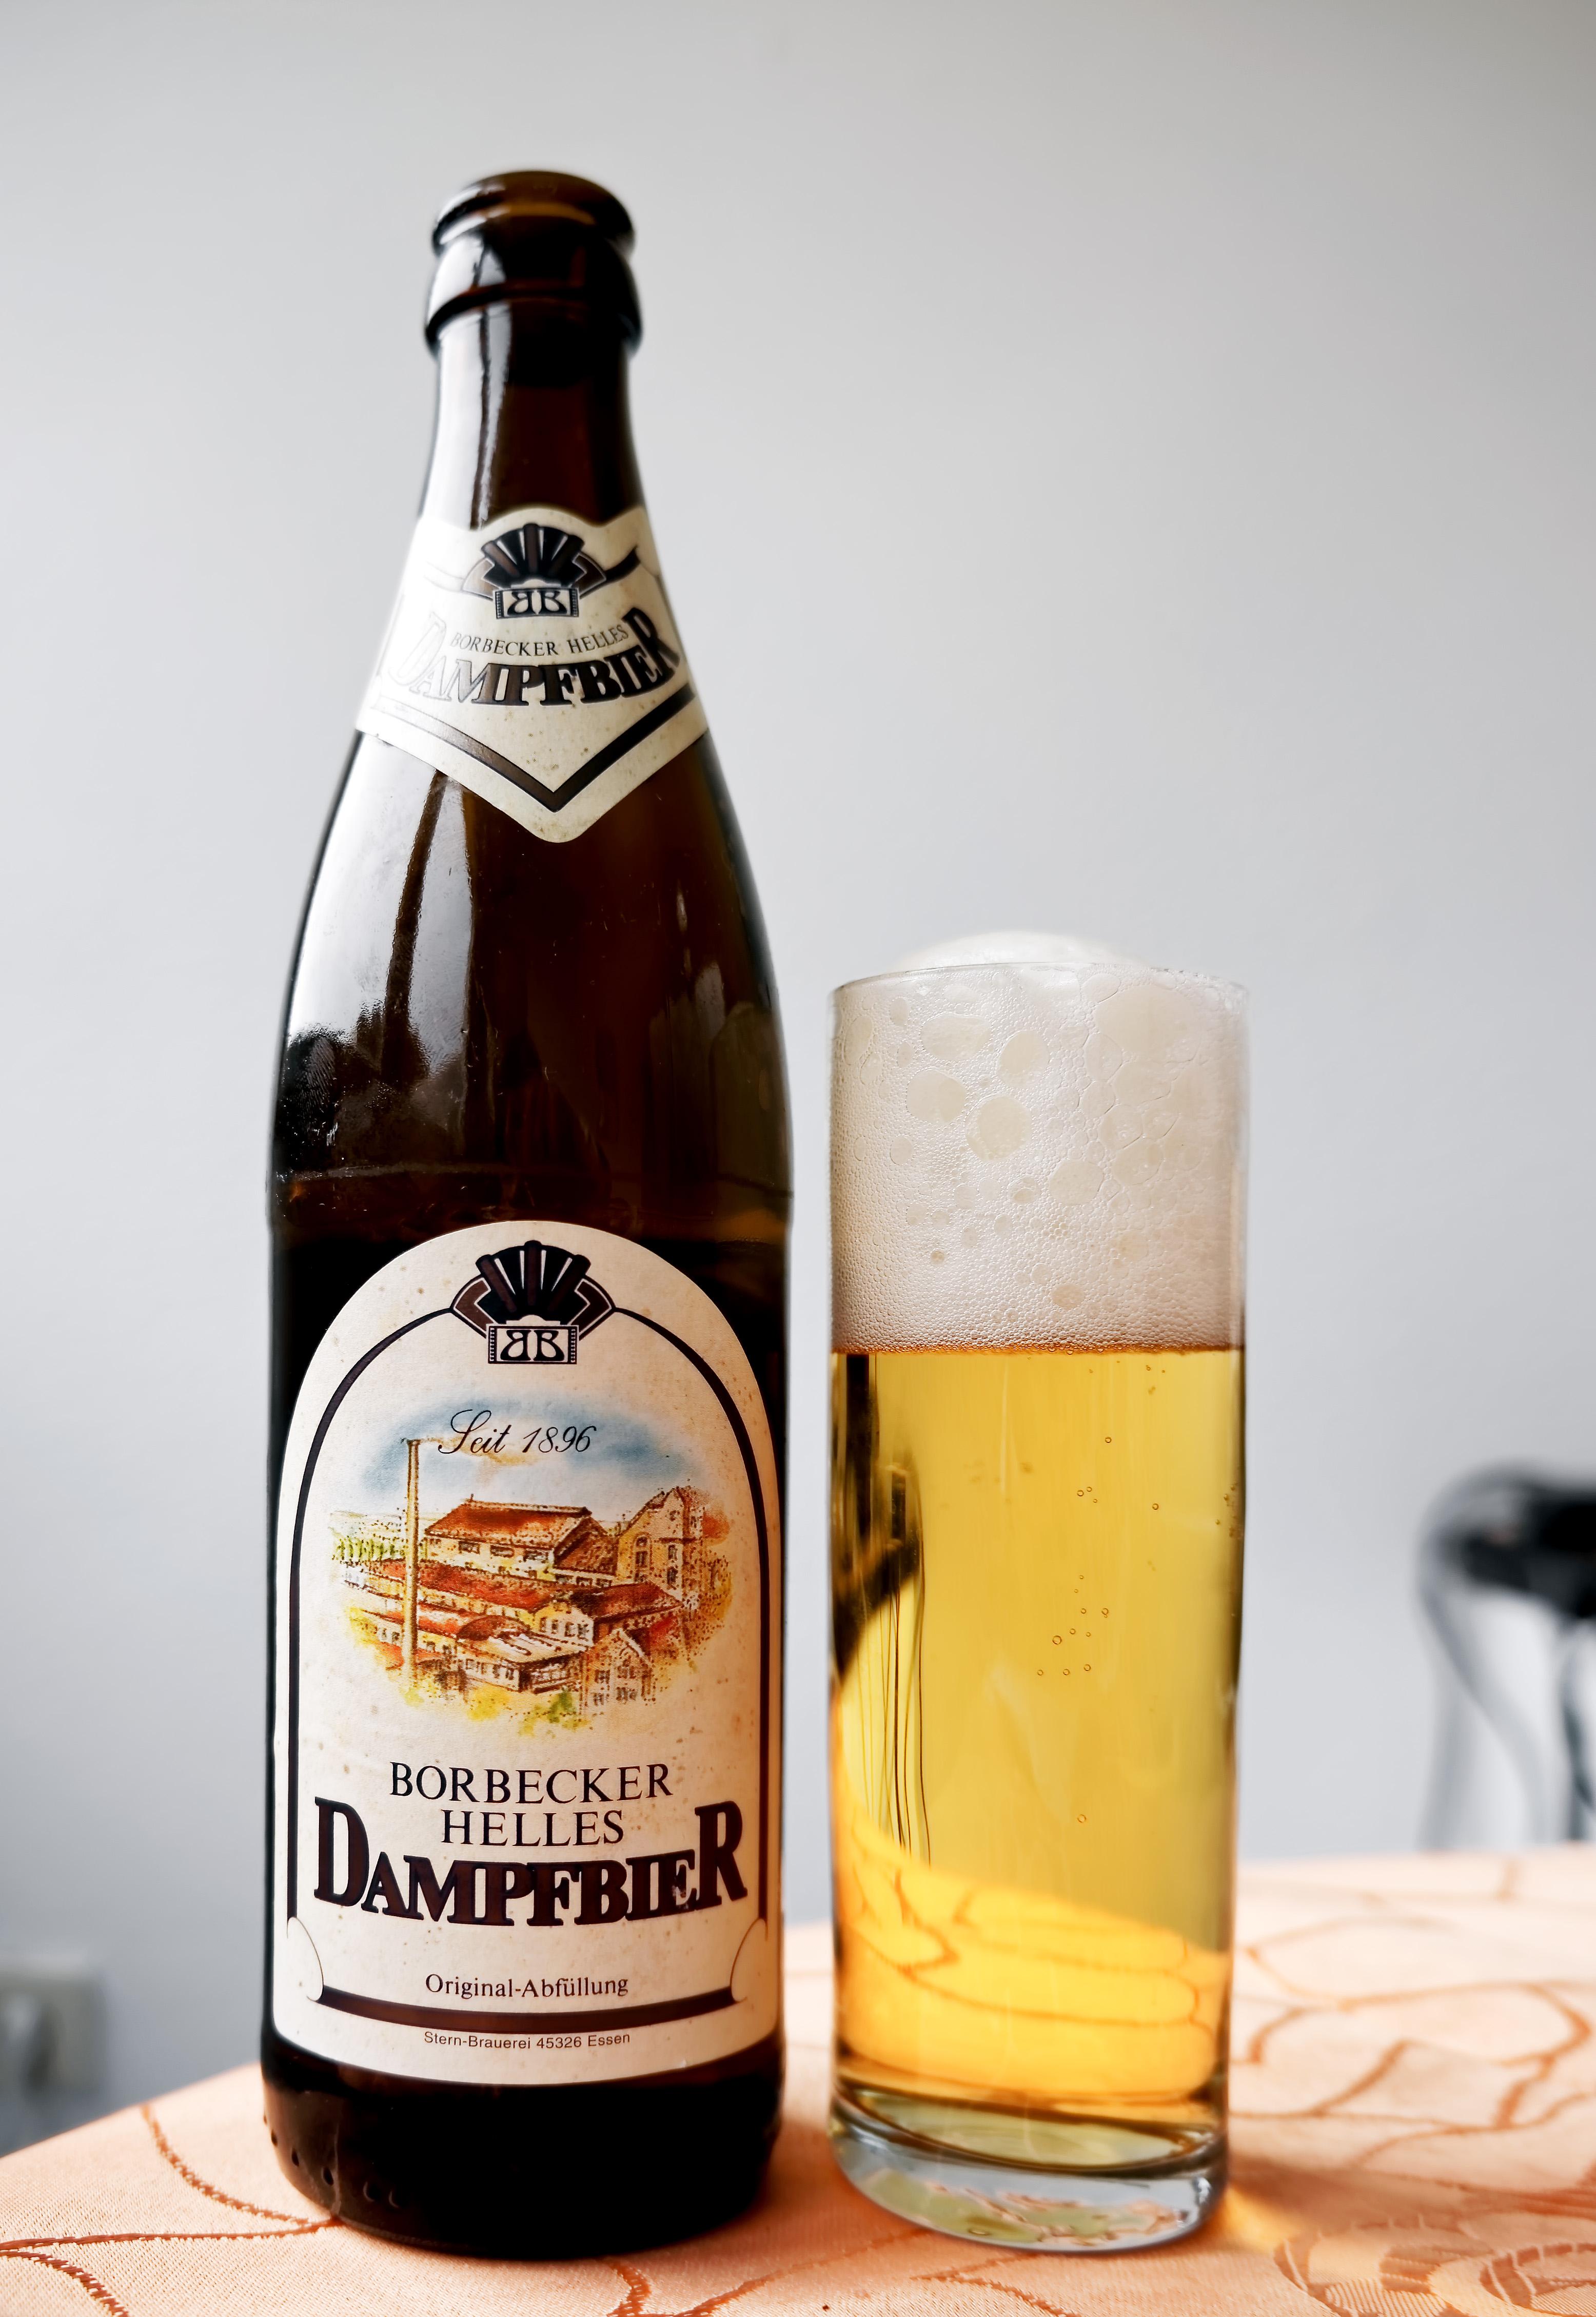 Borbecker Helles Dampfbier ボアベッカー・ヘレス・ダンプフビア - 麦 ...